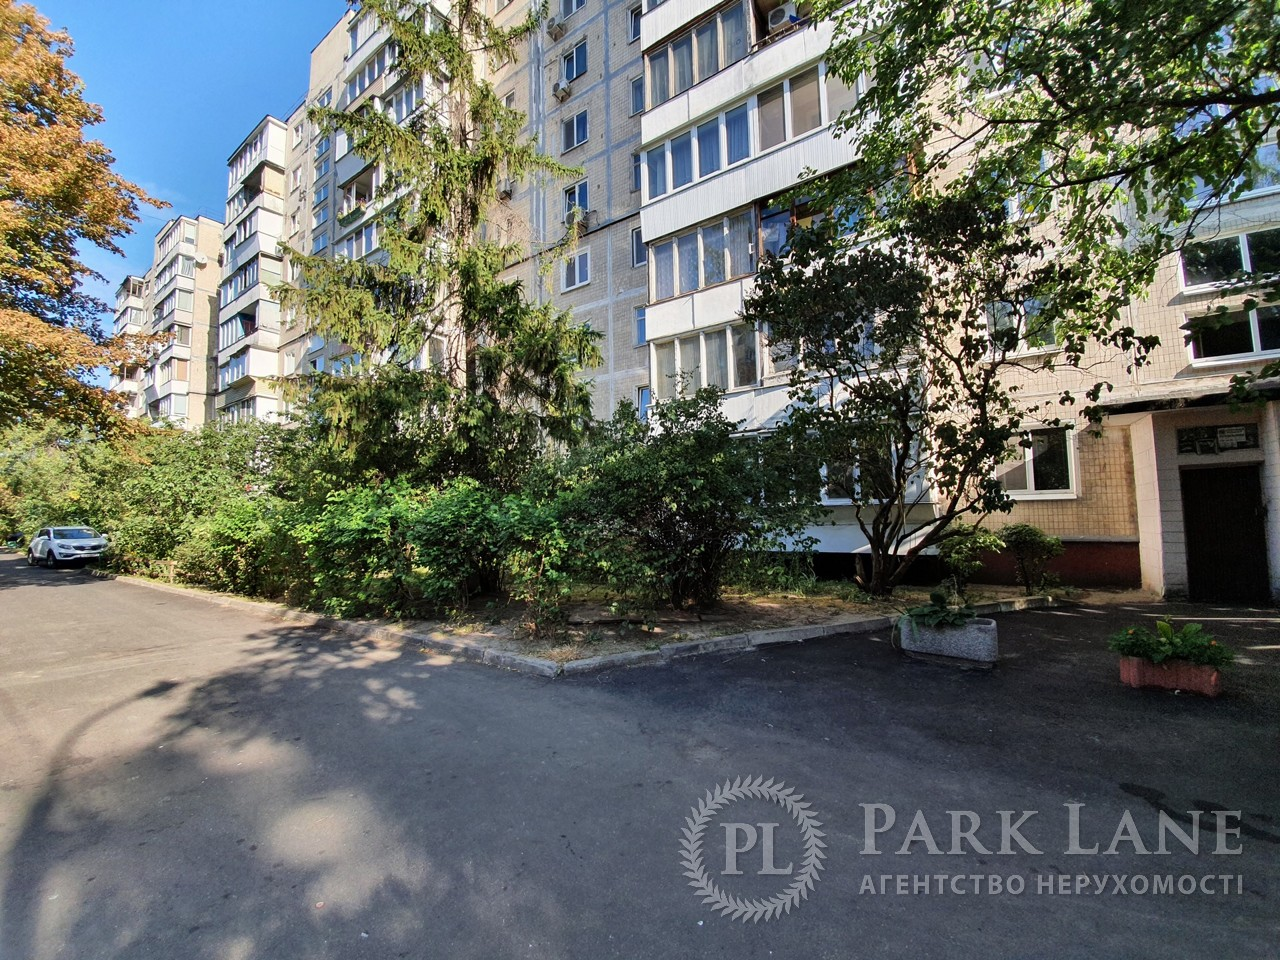 Квартира ул. Энтузиастов, 43, Киев, Z-722433 - Фото 1